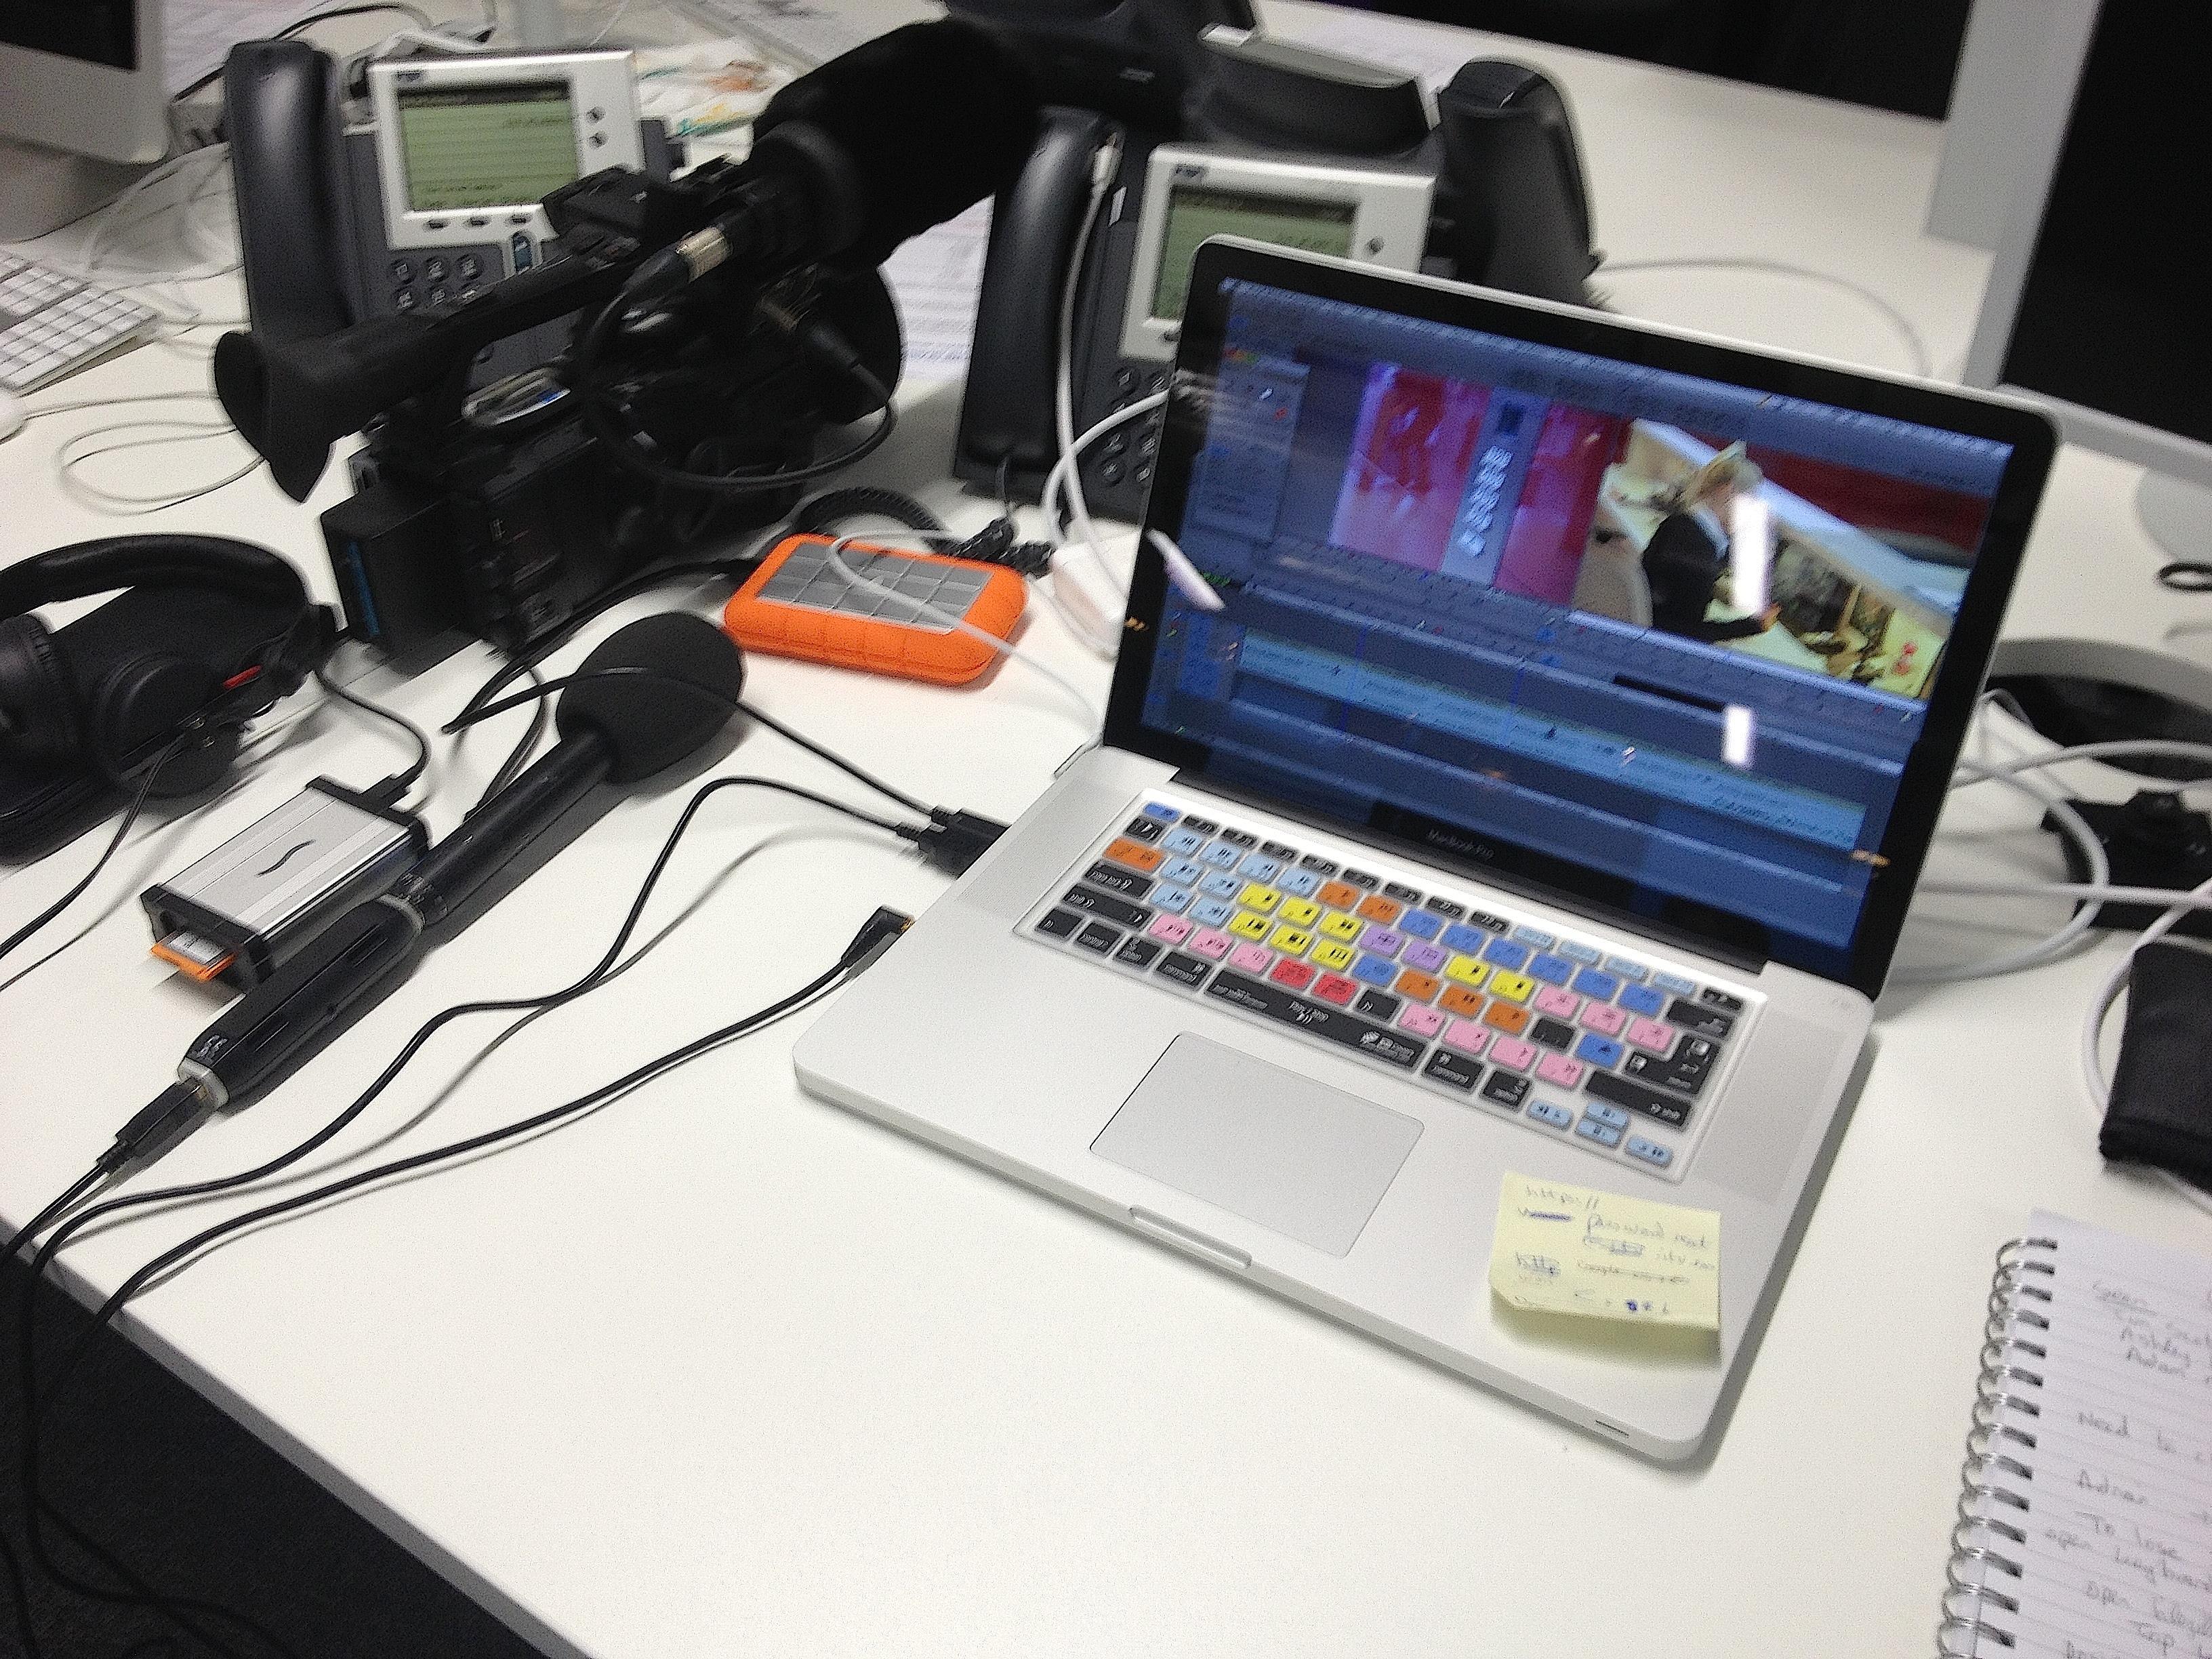 Laptop editing